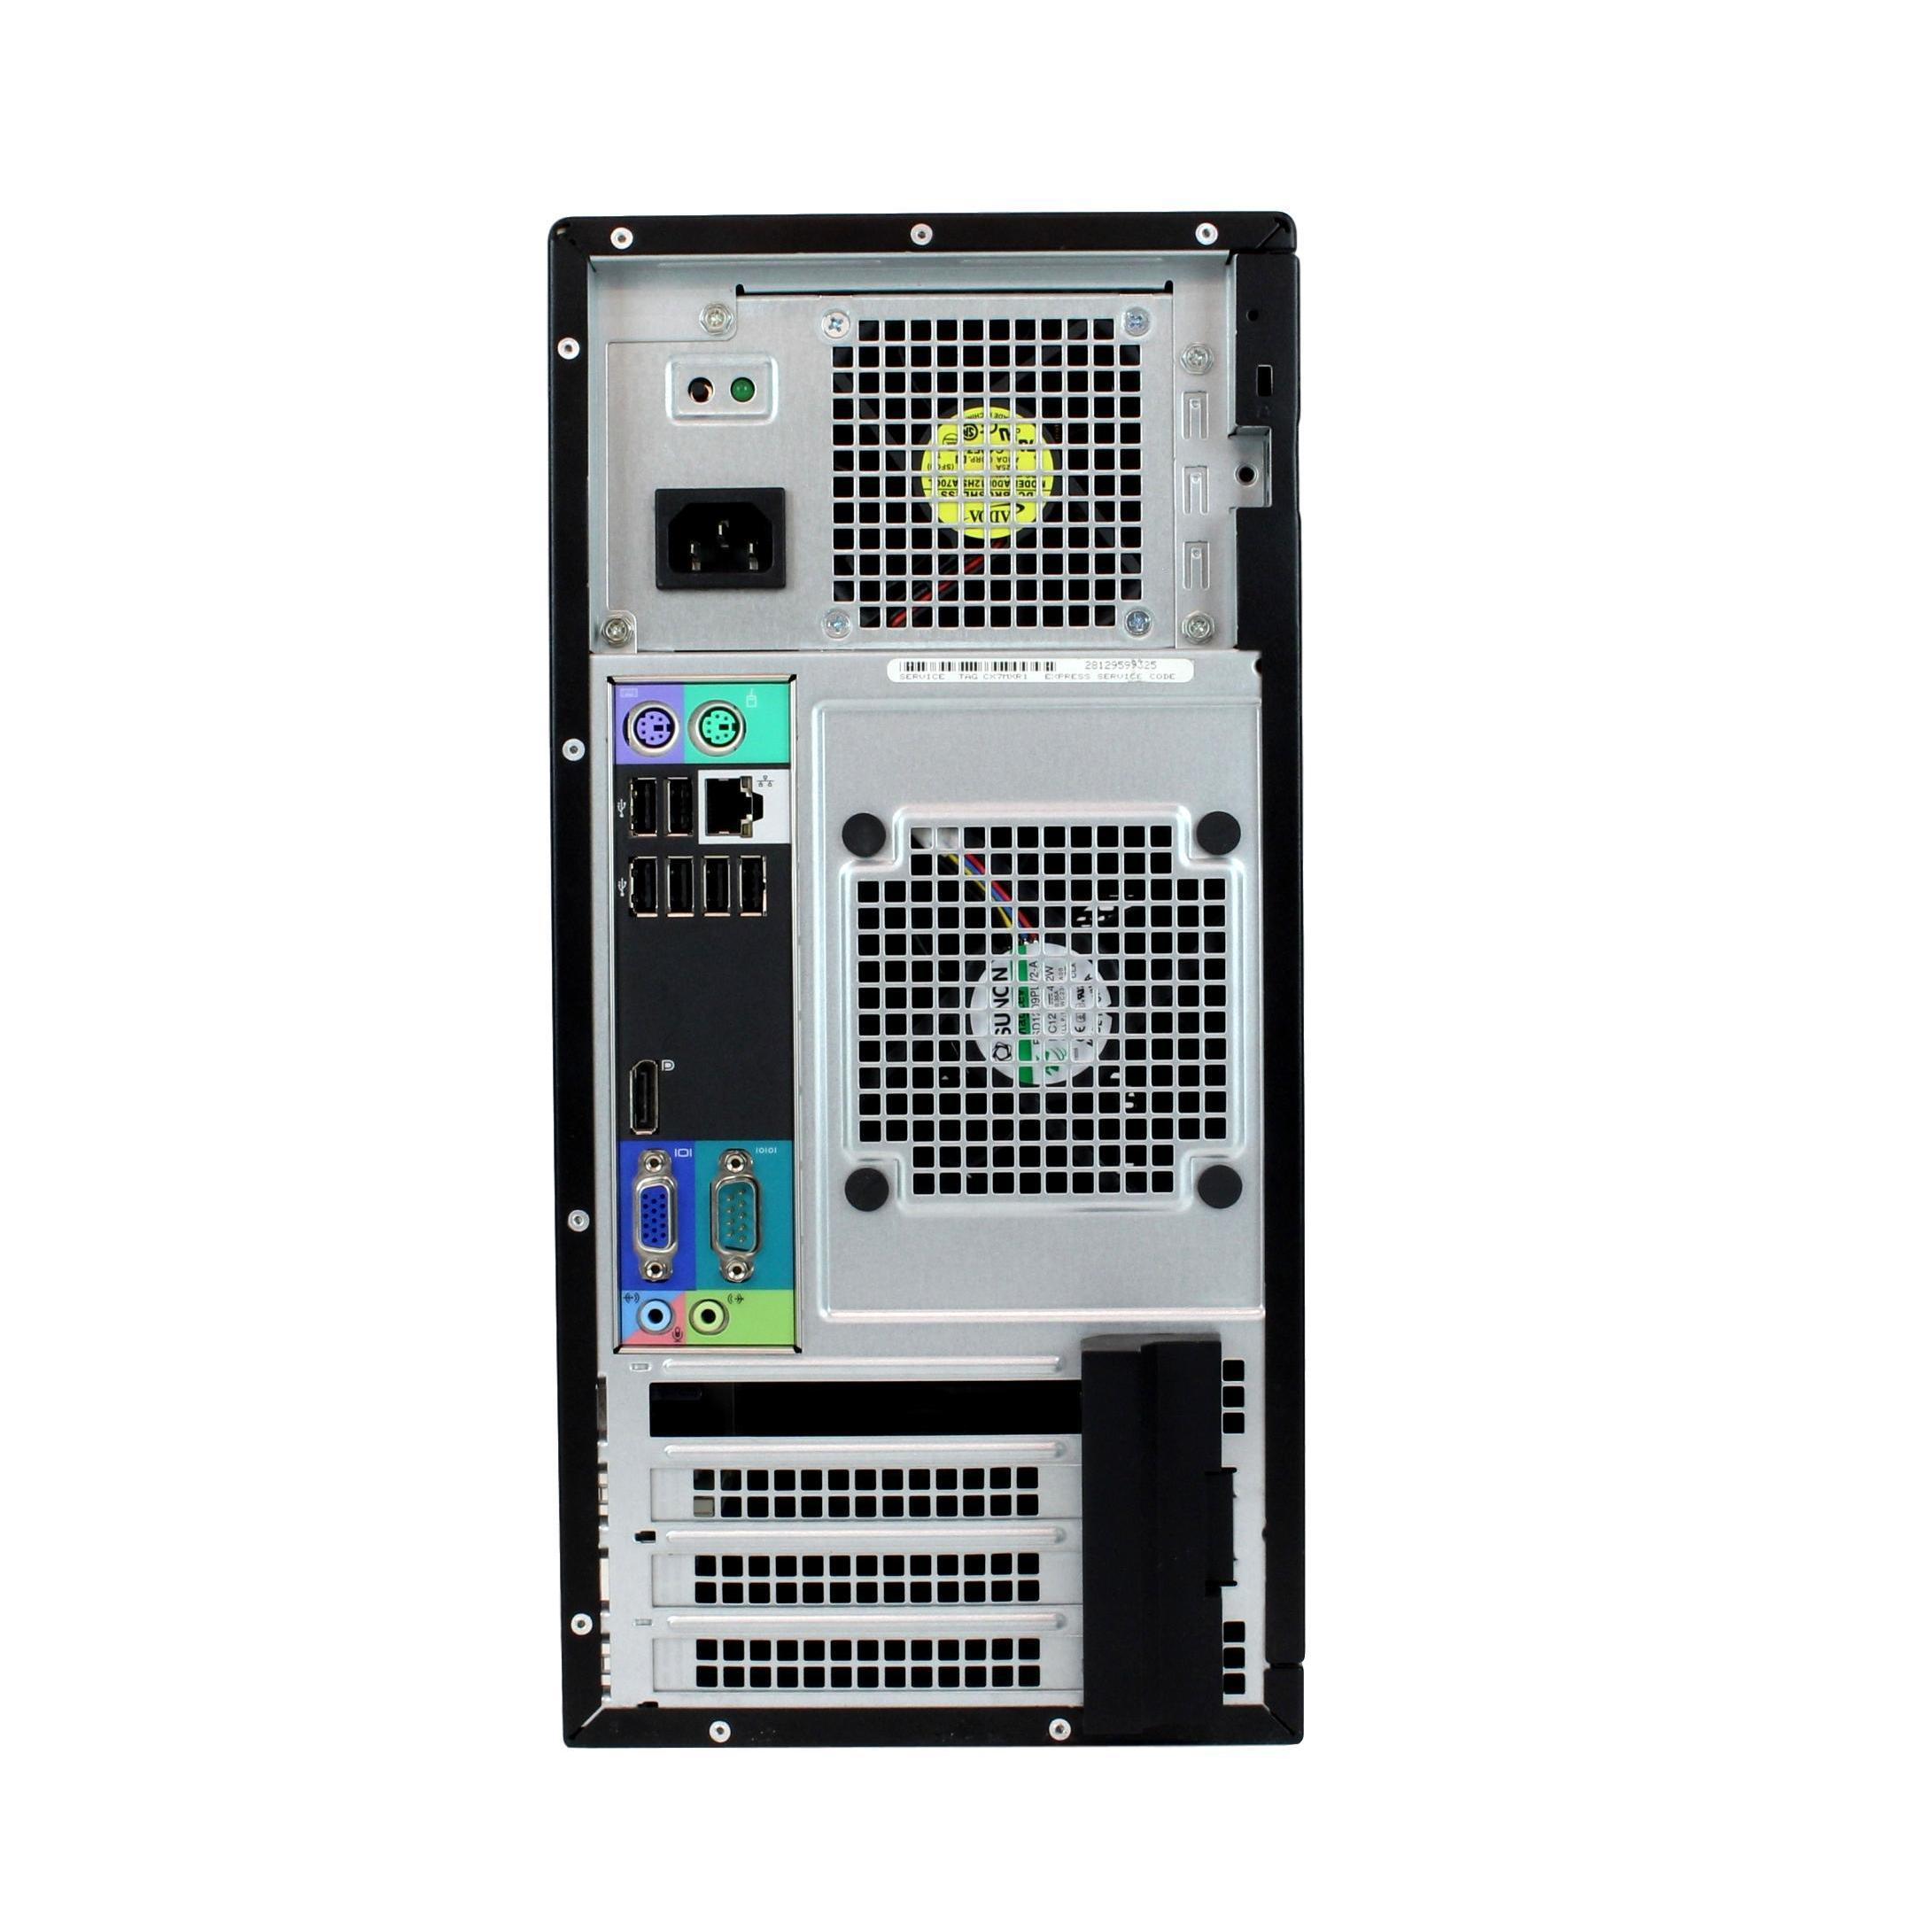 Dell OptiPlex 790 MT Core i3 3,3 GHz - HDD 250 Go RAM 2 Go